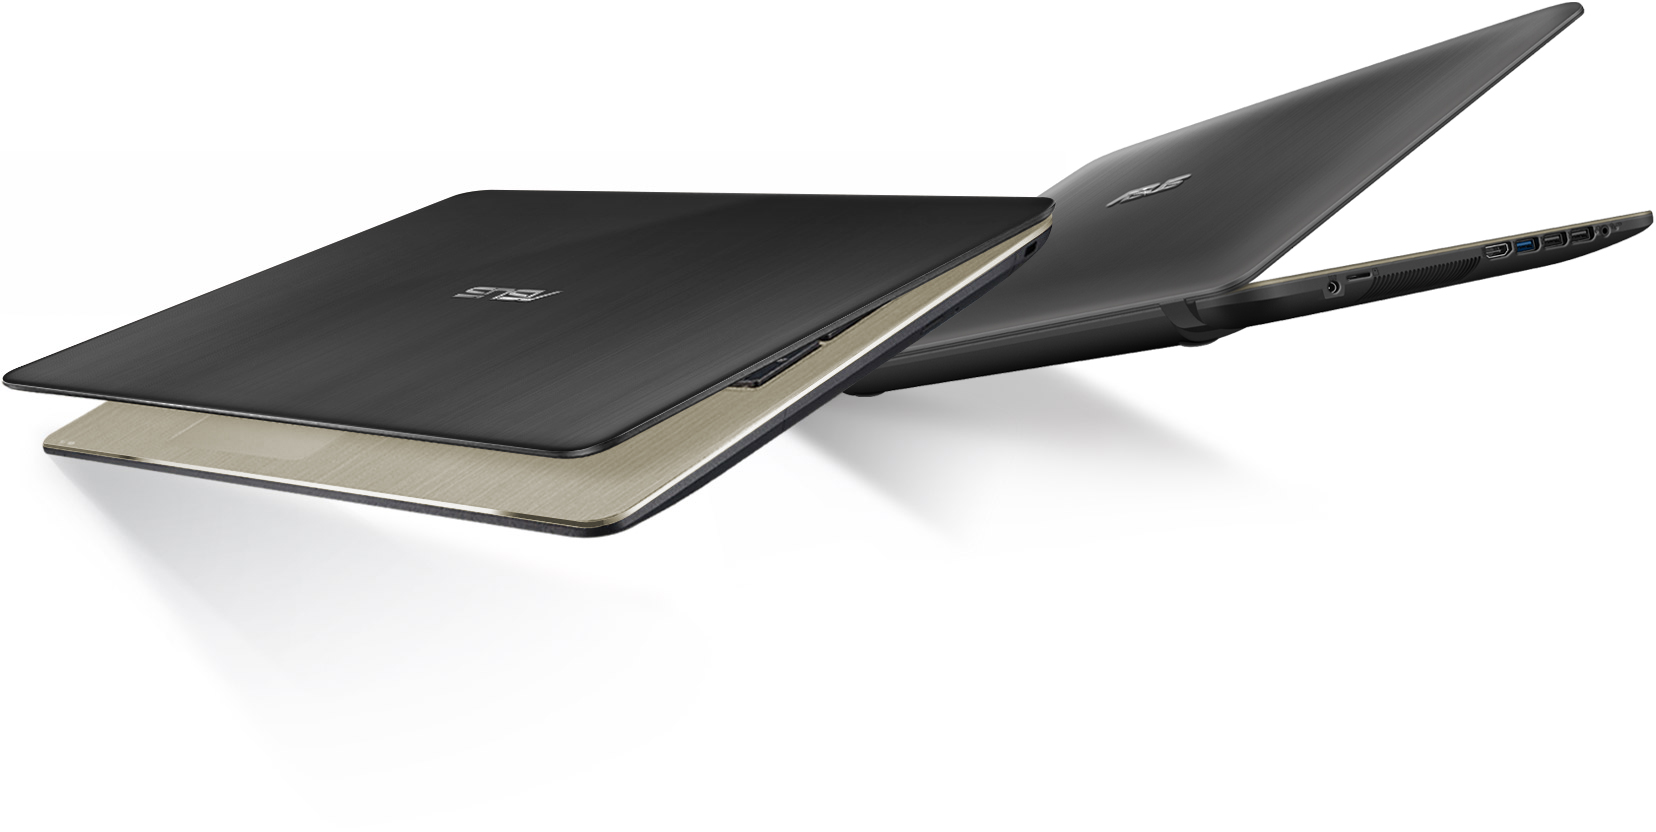 ноутбук asus x541na gq335t драйвера для windows 7